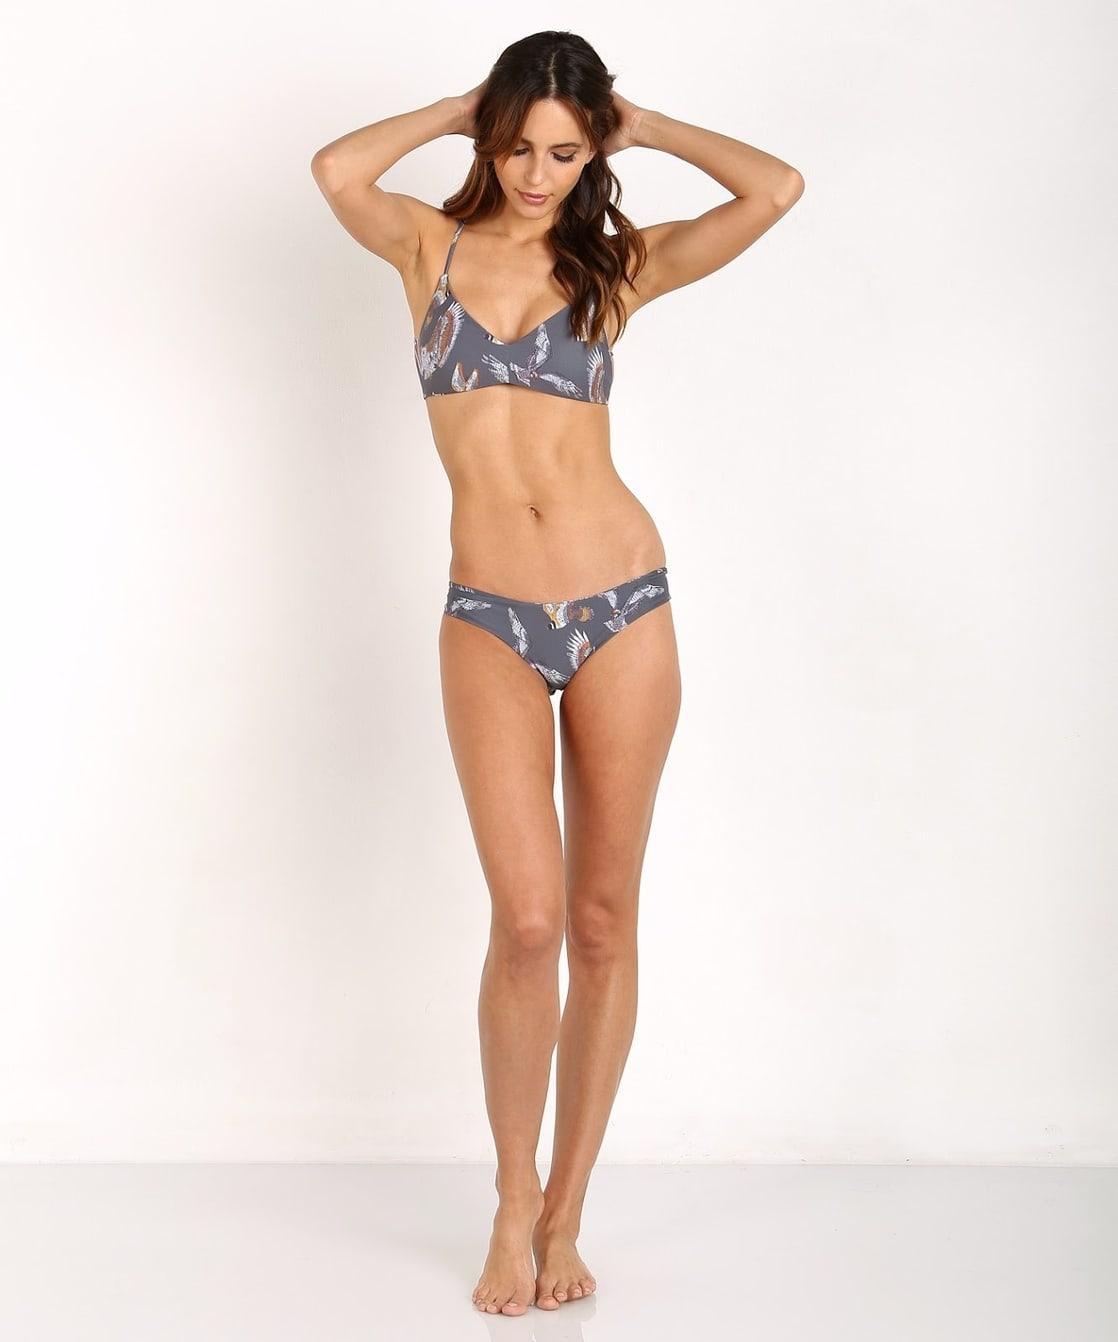 Leaked Amanda Marie Pizziconi nude (79 foto and video), Topless, Leaked, Feet, panties 2006